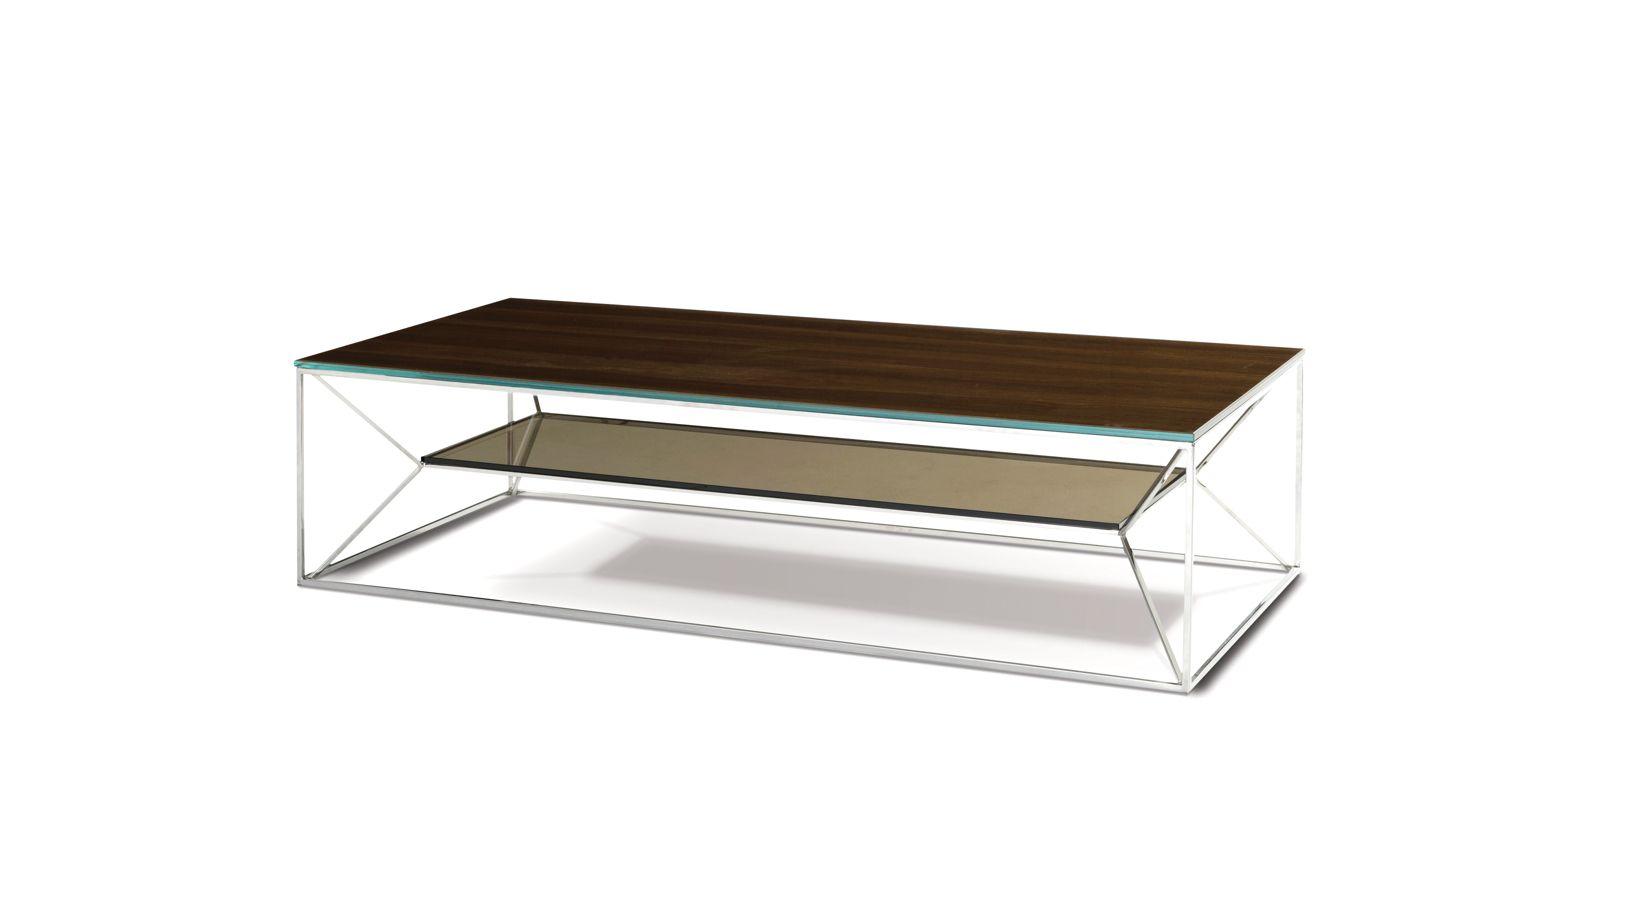 meuble tv tribeca roche bobois. Black Bedroom Furniture Sets. Home Design Ideas